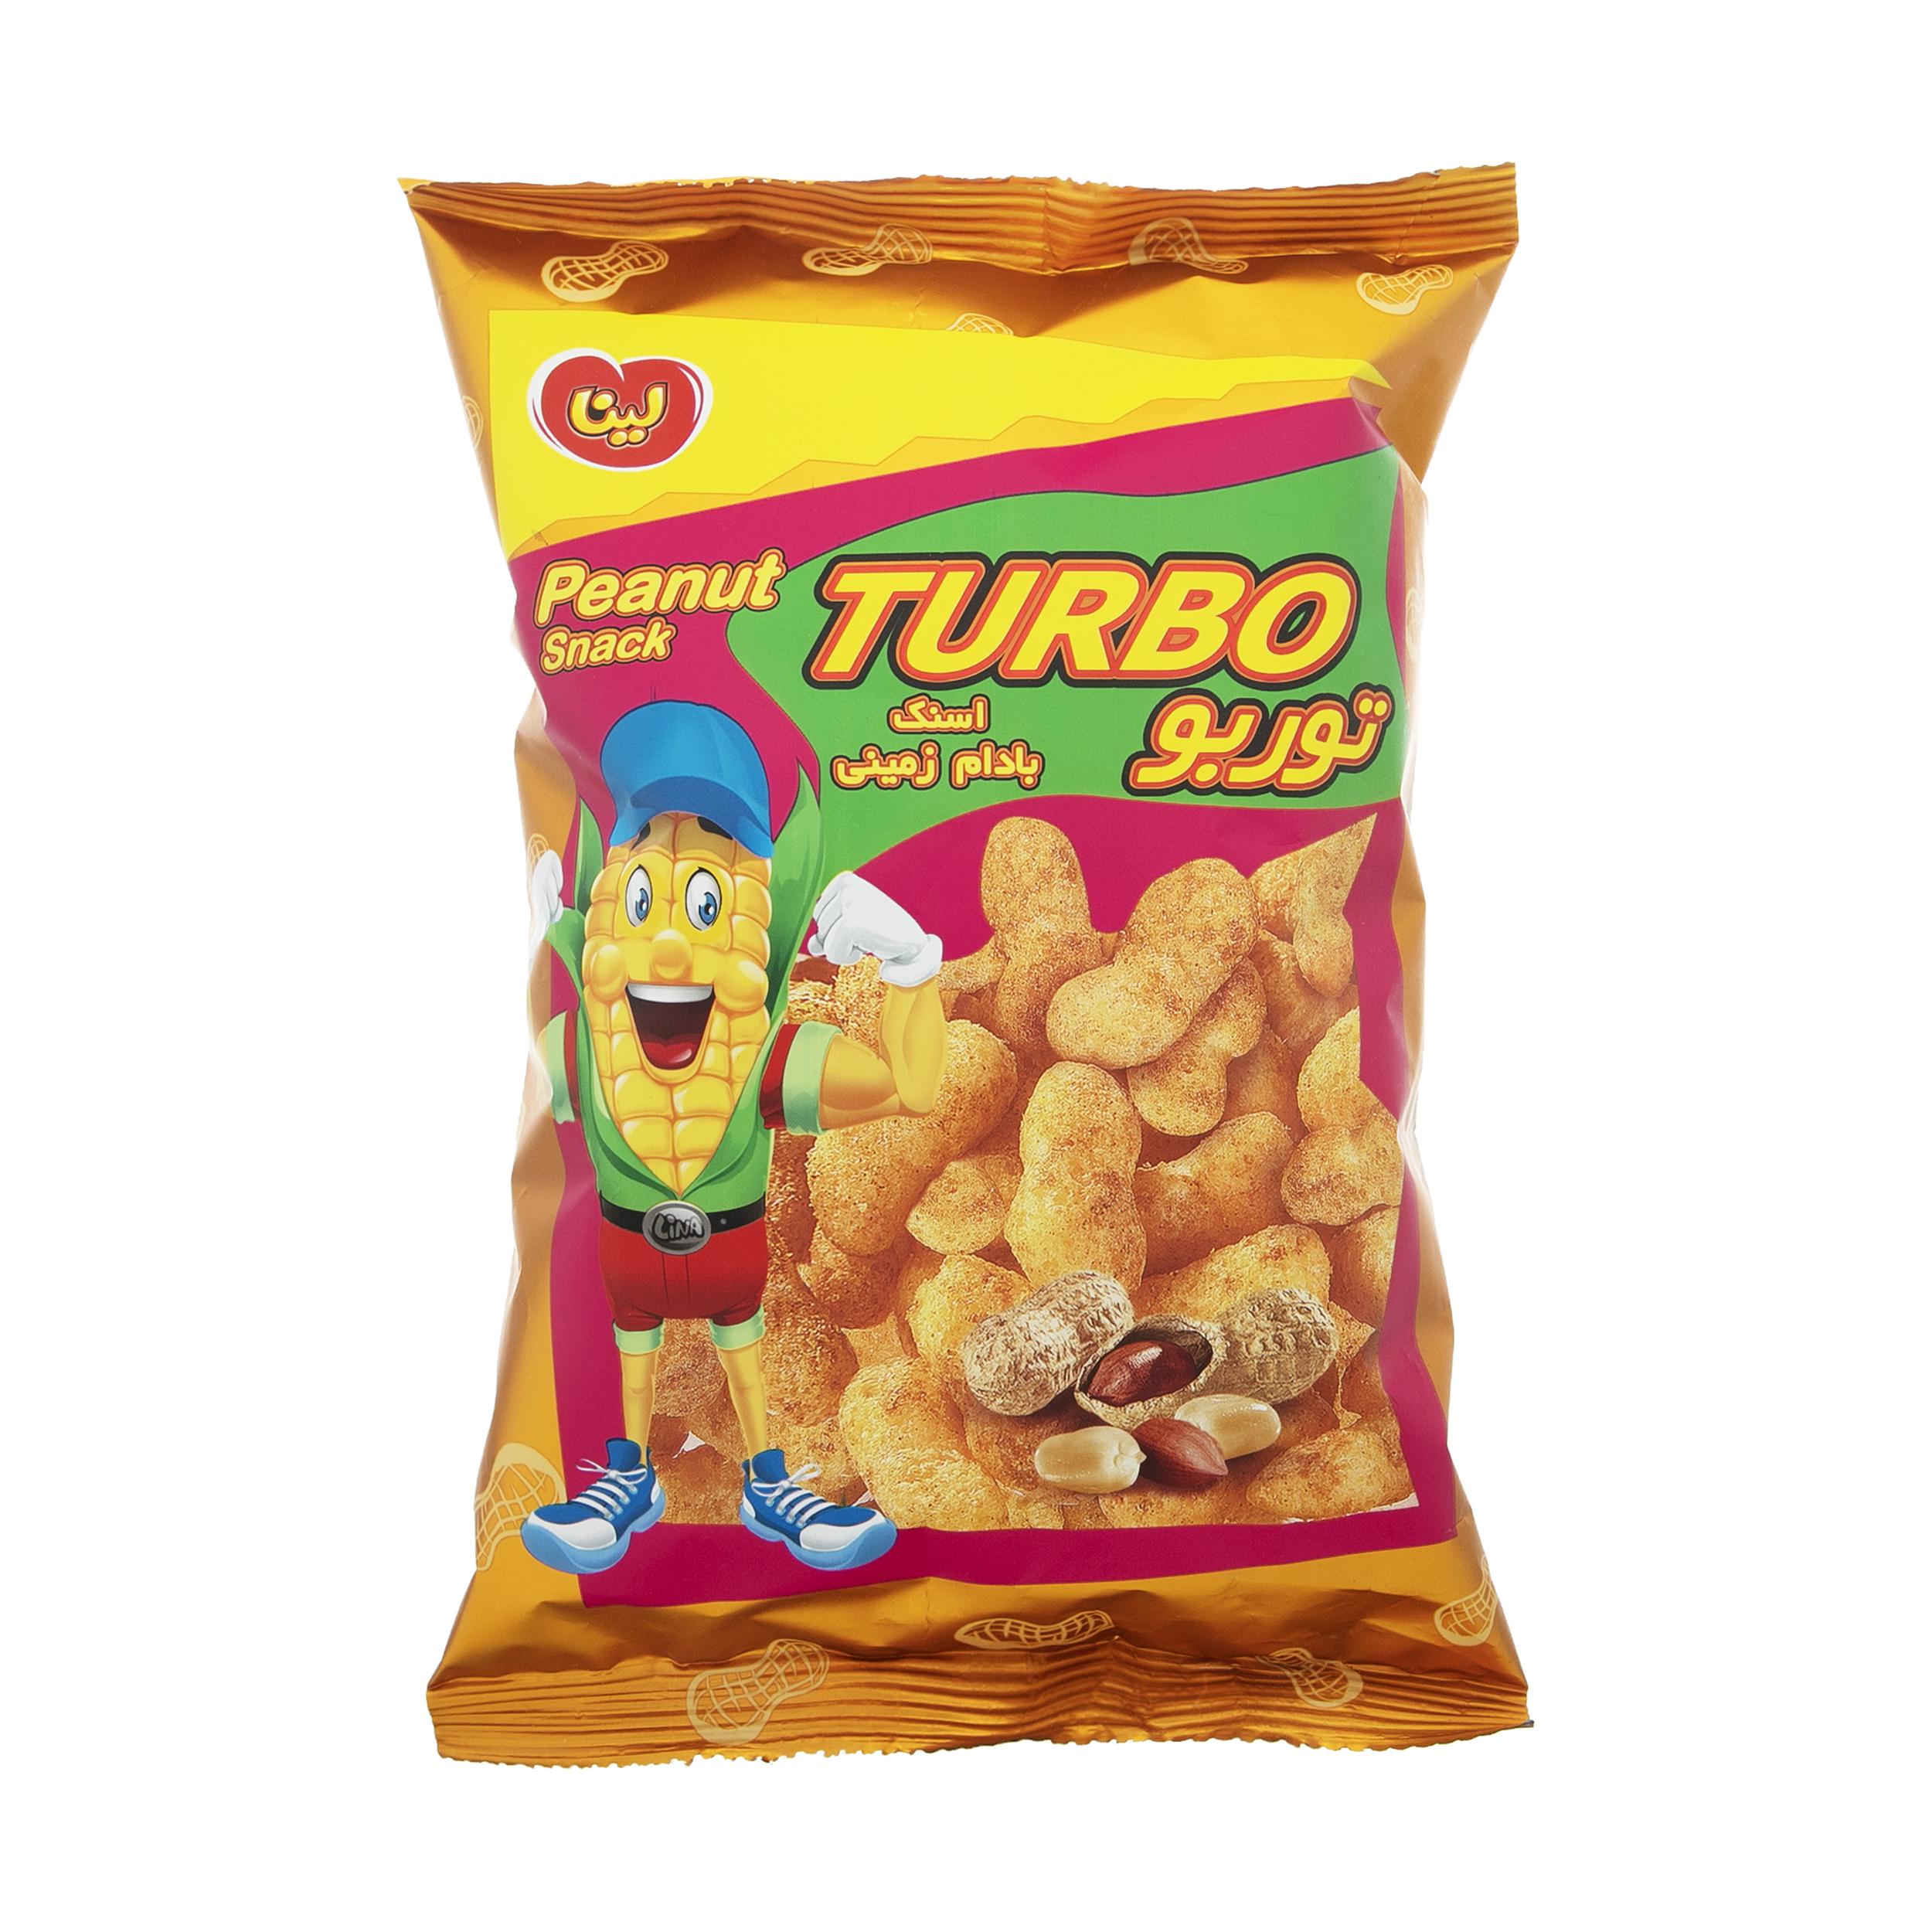 اسنک توربو لینا با طعم بادام زمینی - 50 گرم